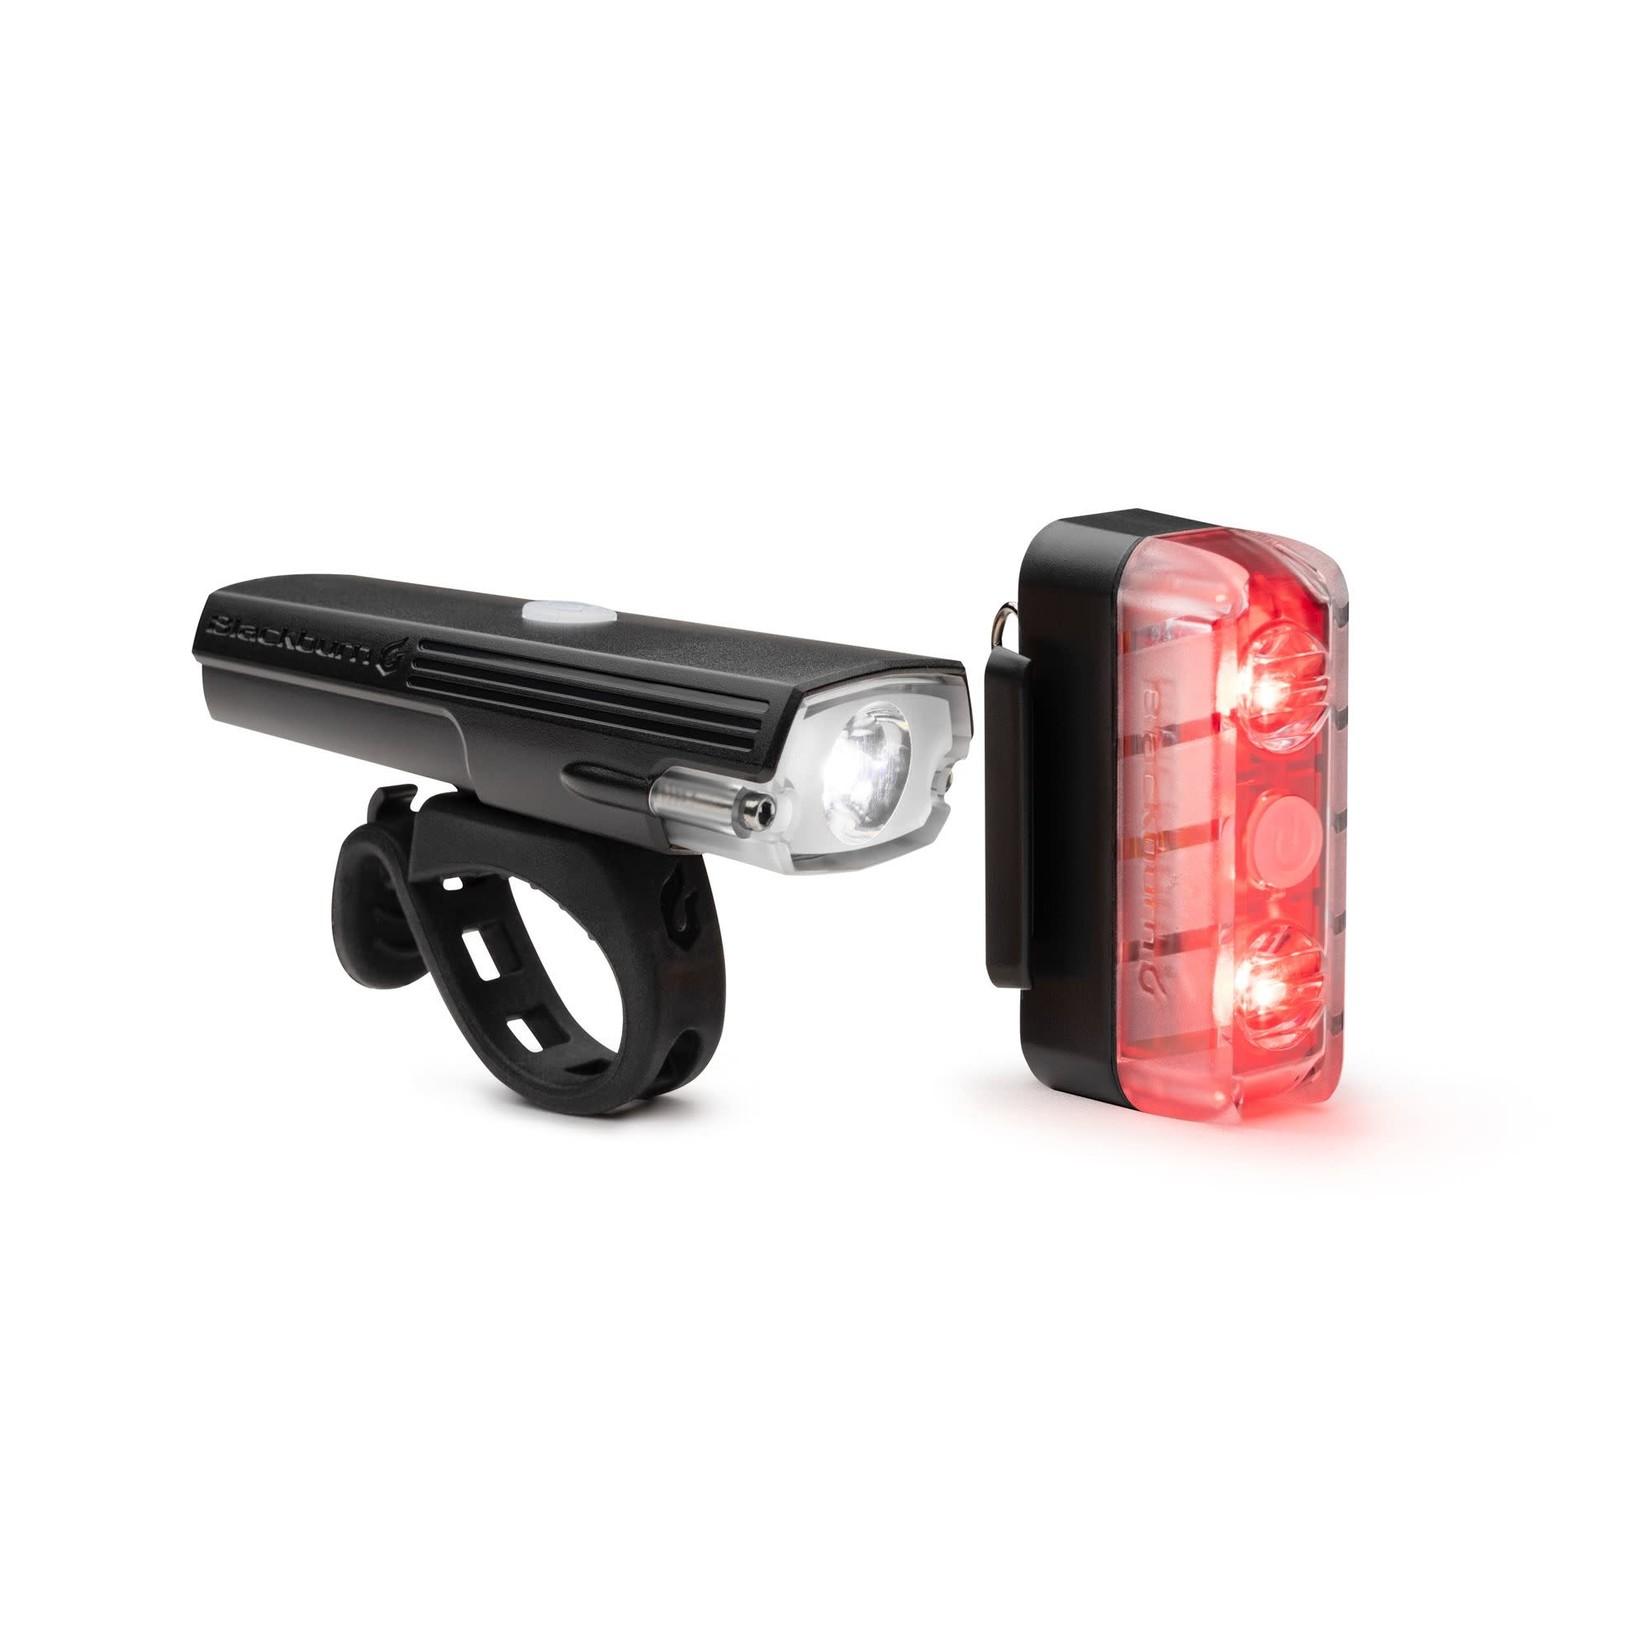 LIGHT Blackburn Dayblazer 400 Front/65 Rear Light Combo - Black